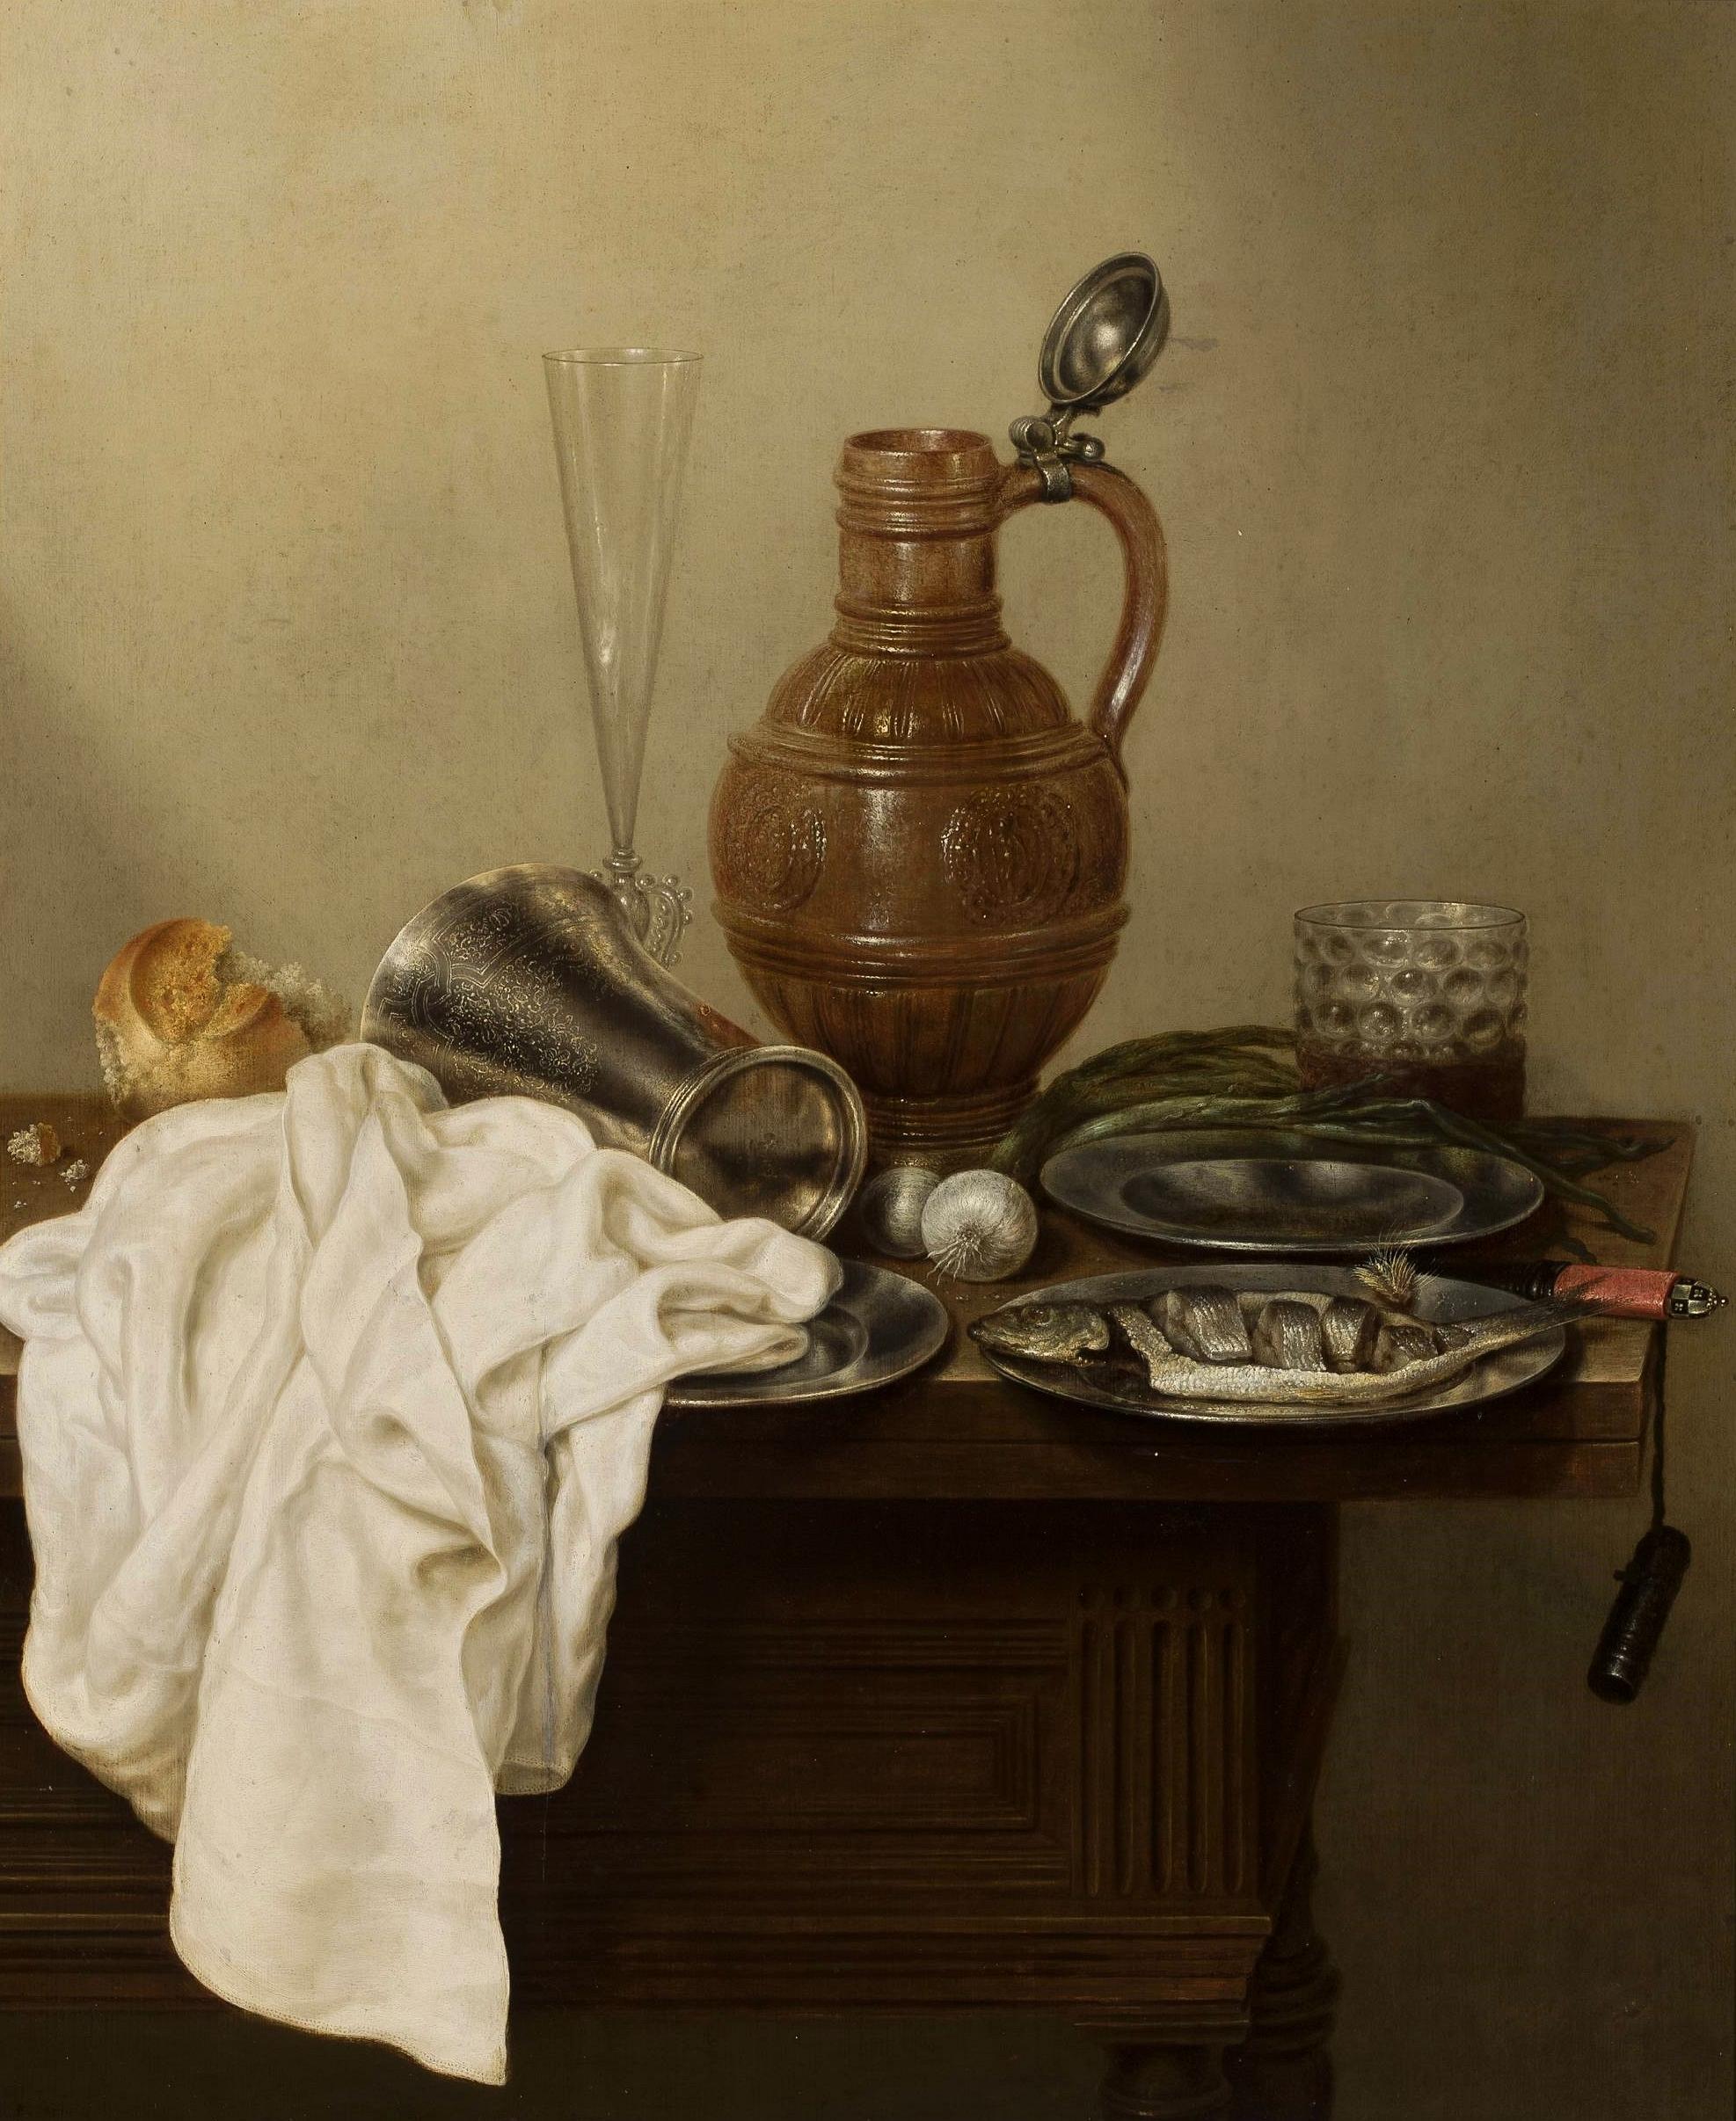 Still life with a stoneware jug